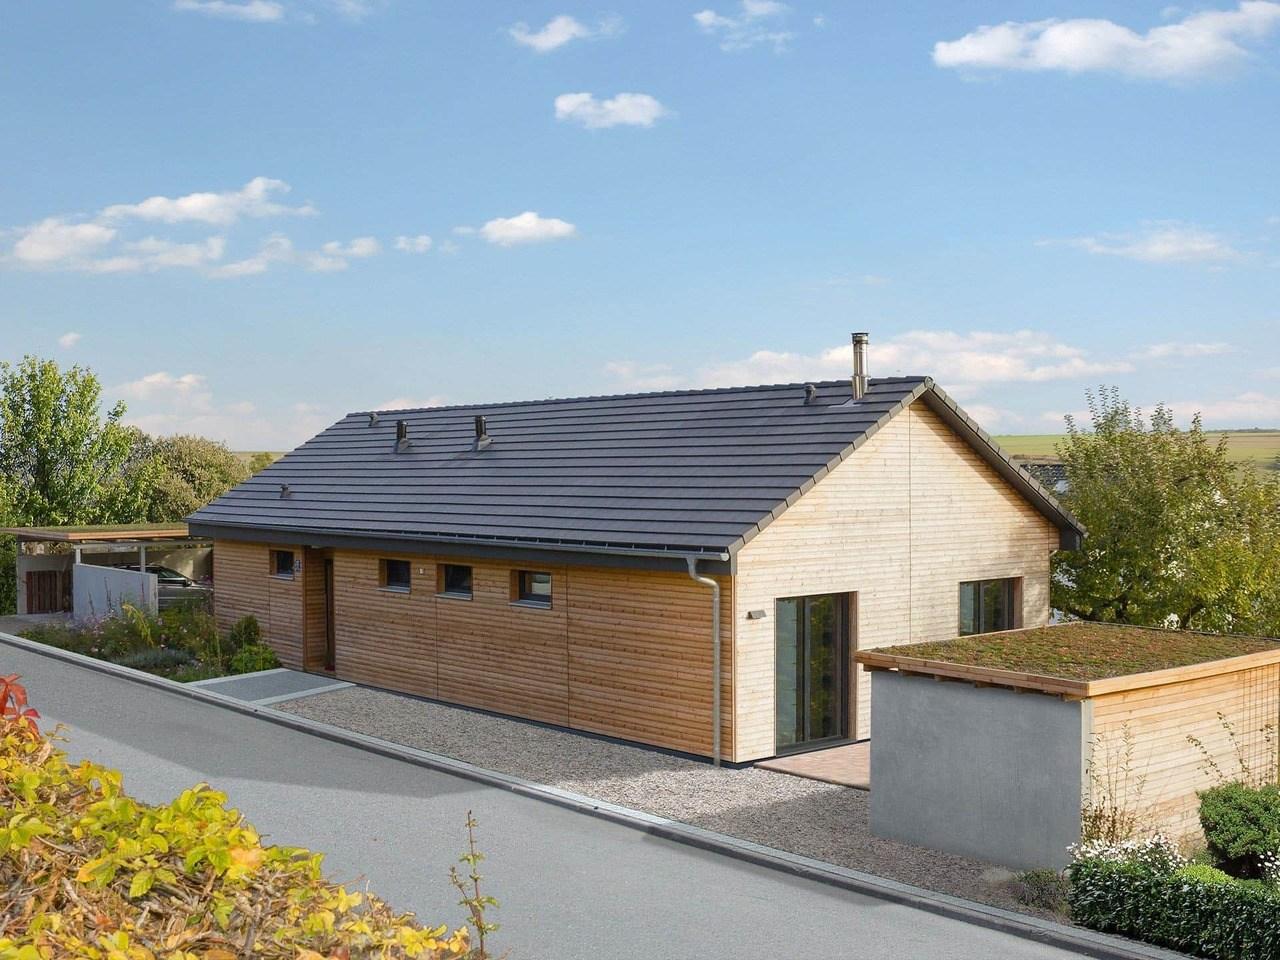 Holzhaus Homestory 381 - LEHNER HAUS